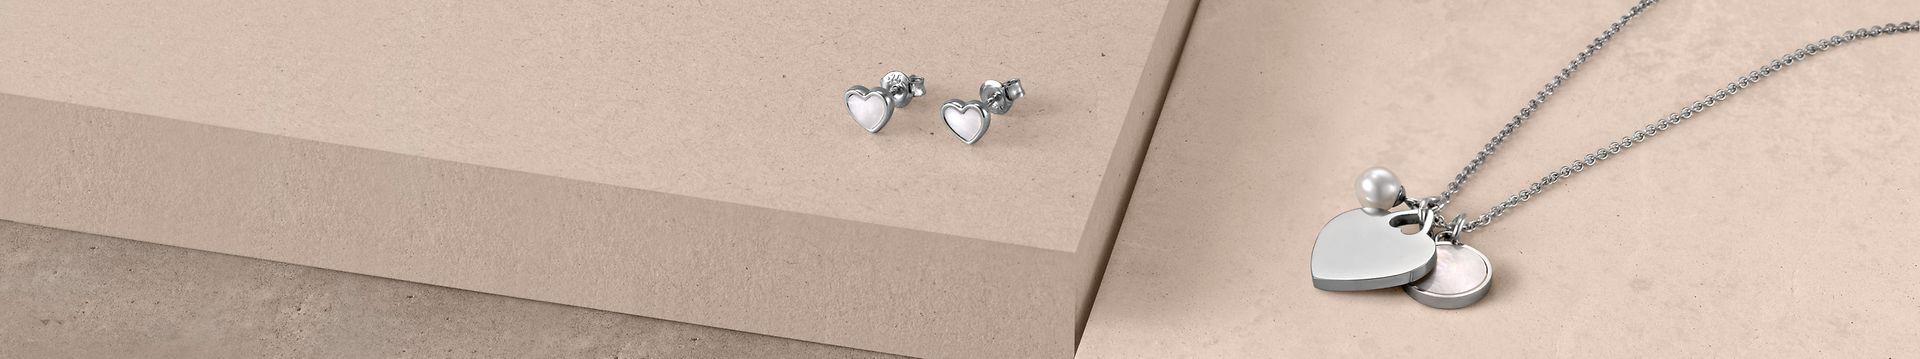 222021 - women - accessories - tc banner - Ohringe - IMG